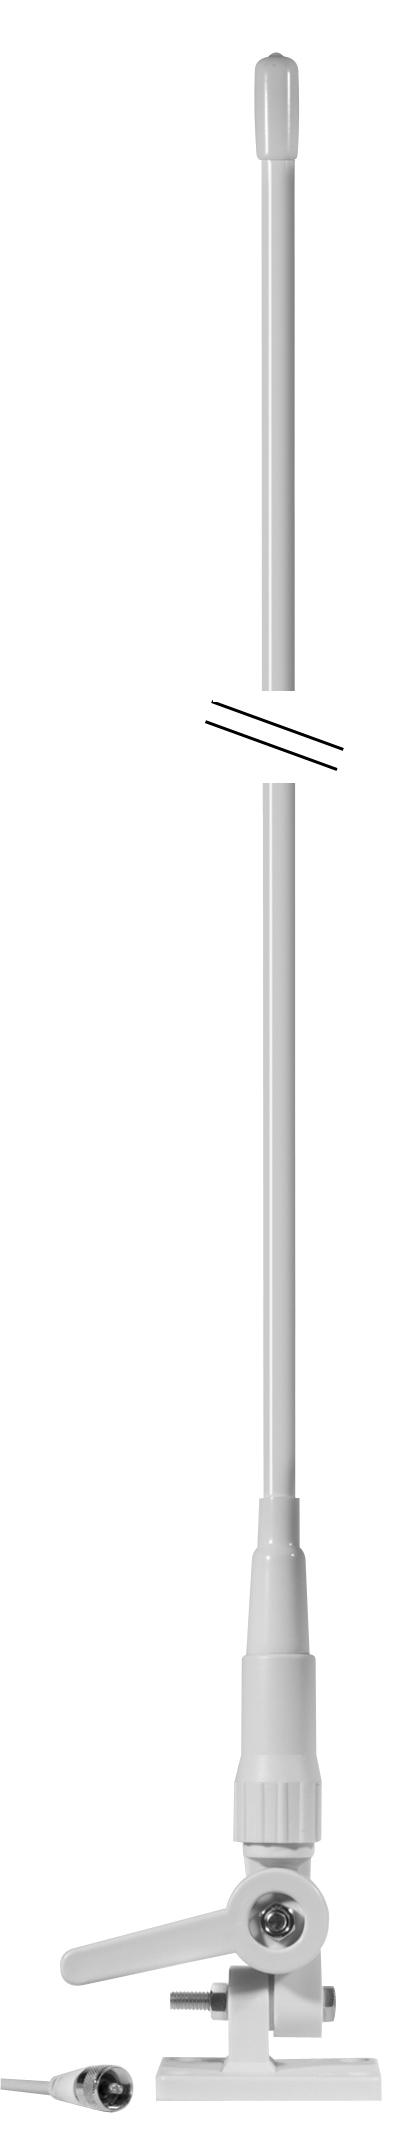 CM300004 - Cobra® 5' 3Db Gain Fiberglass VHF Antenna